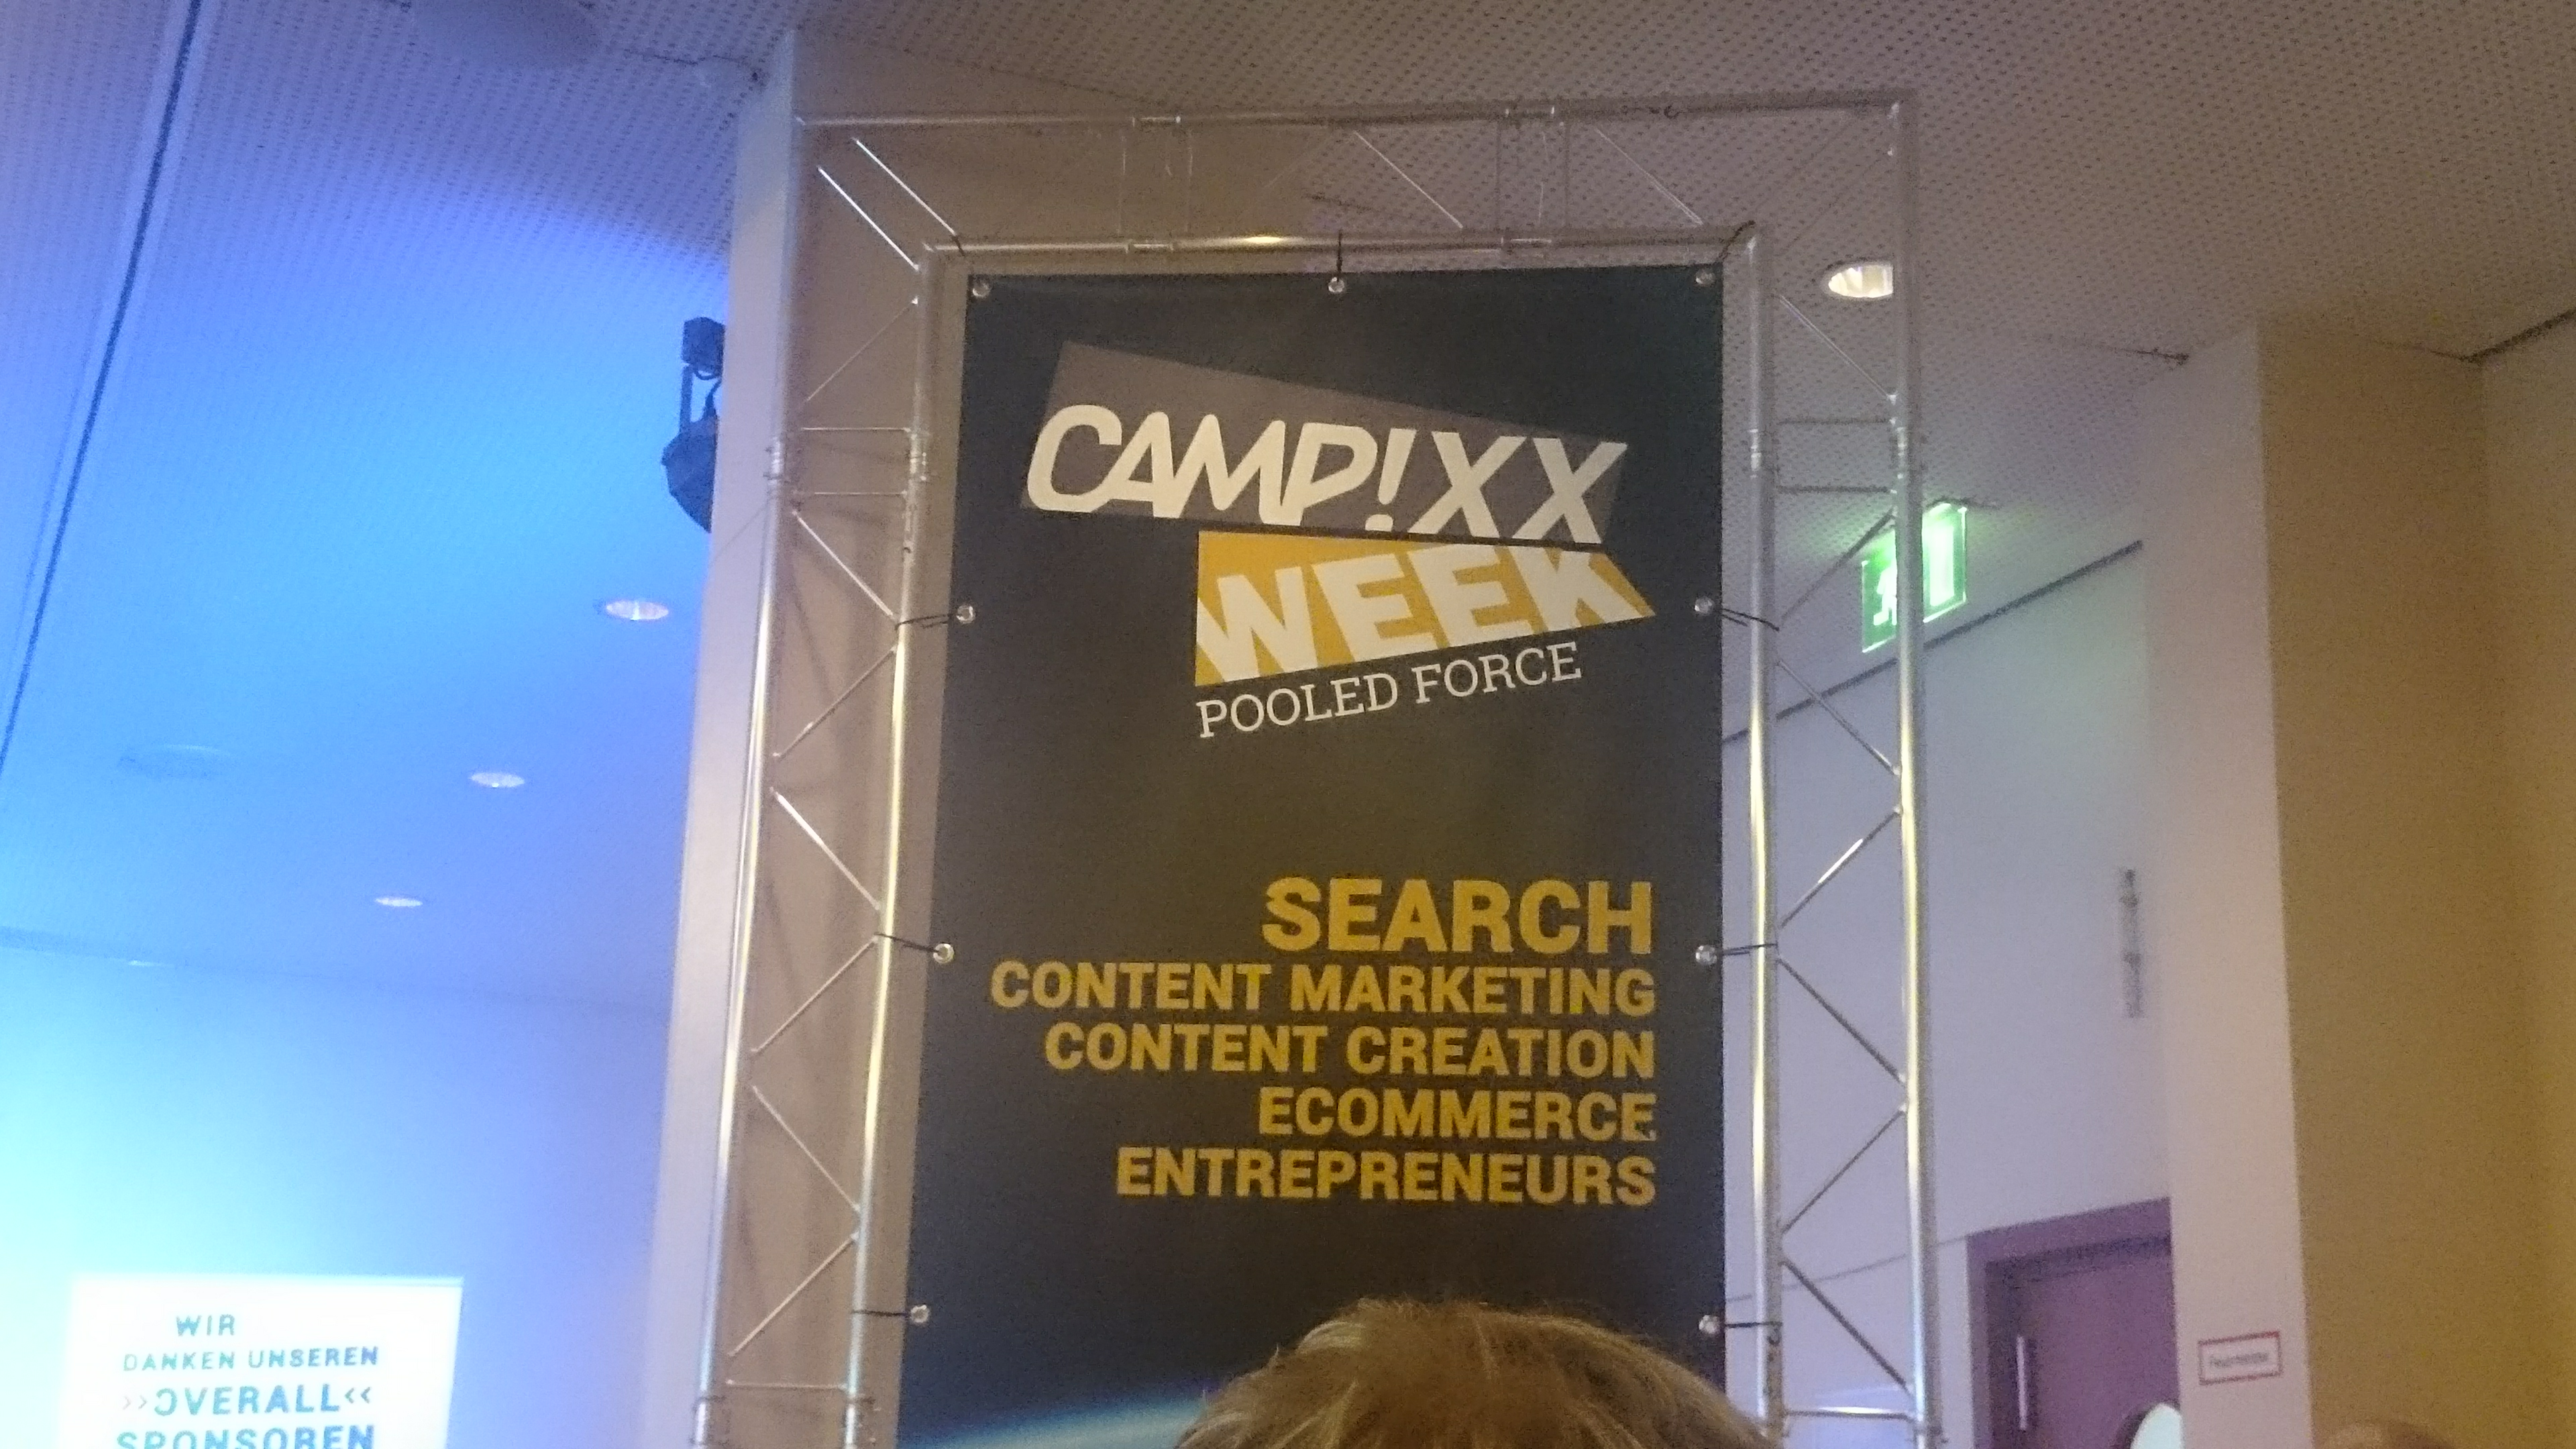 Campixx_Week_bonnie_2